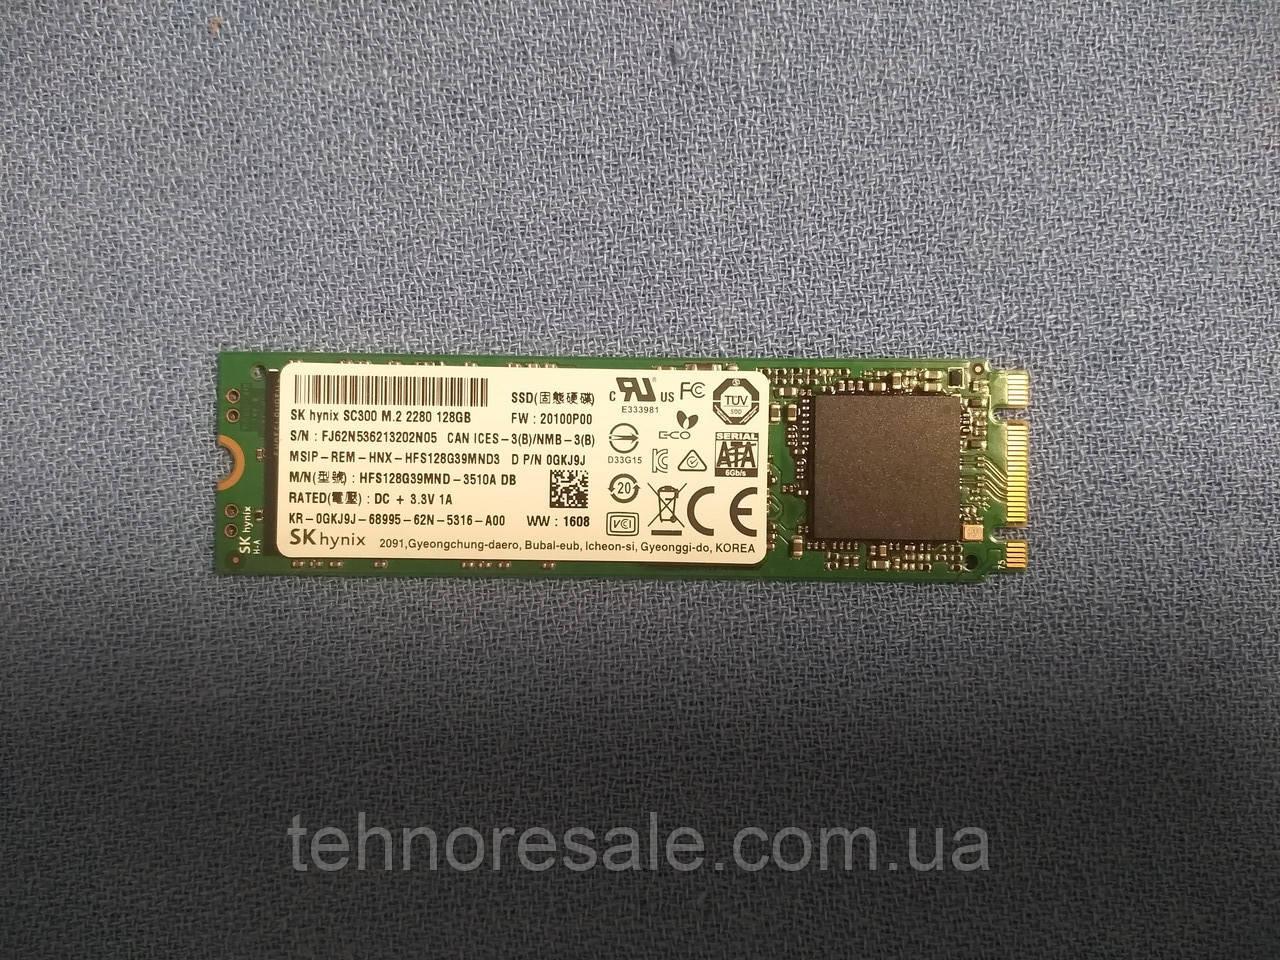 Sandisk x400 SSD M. 2 SSD 128Gb